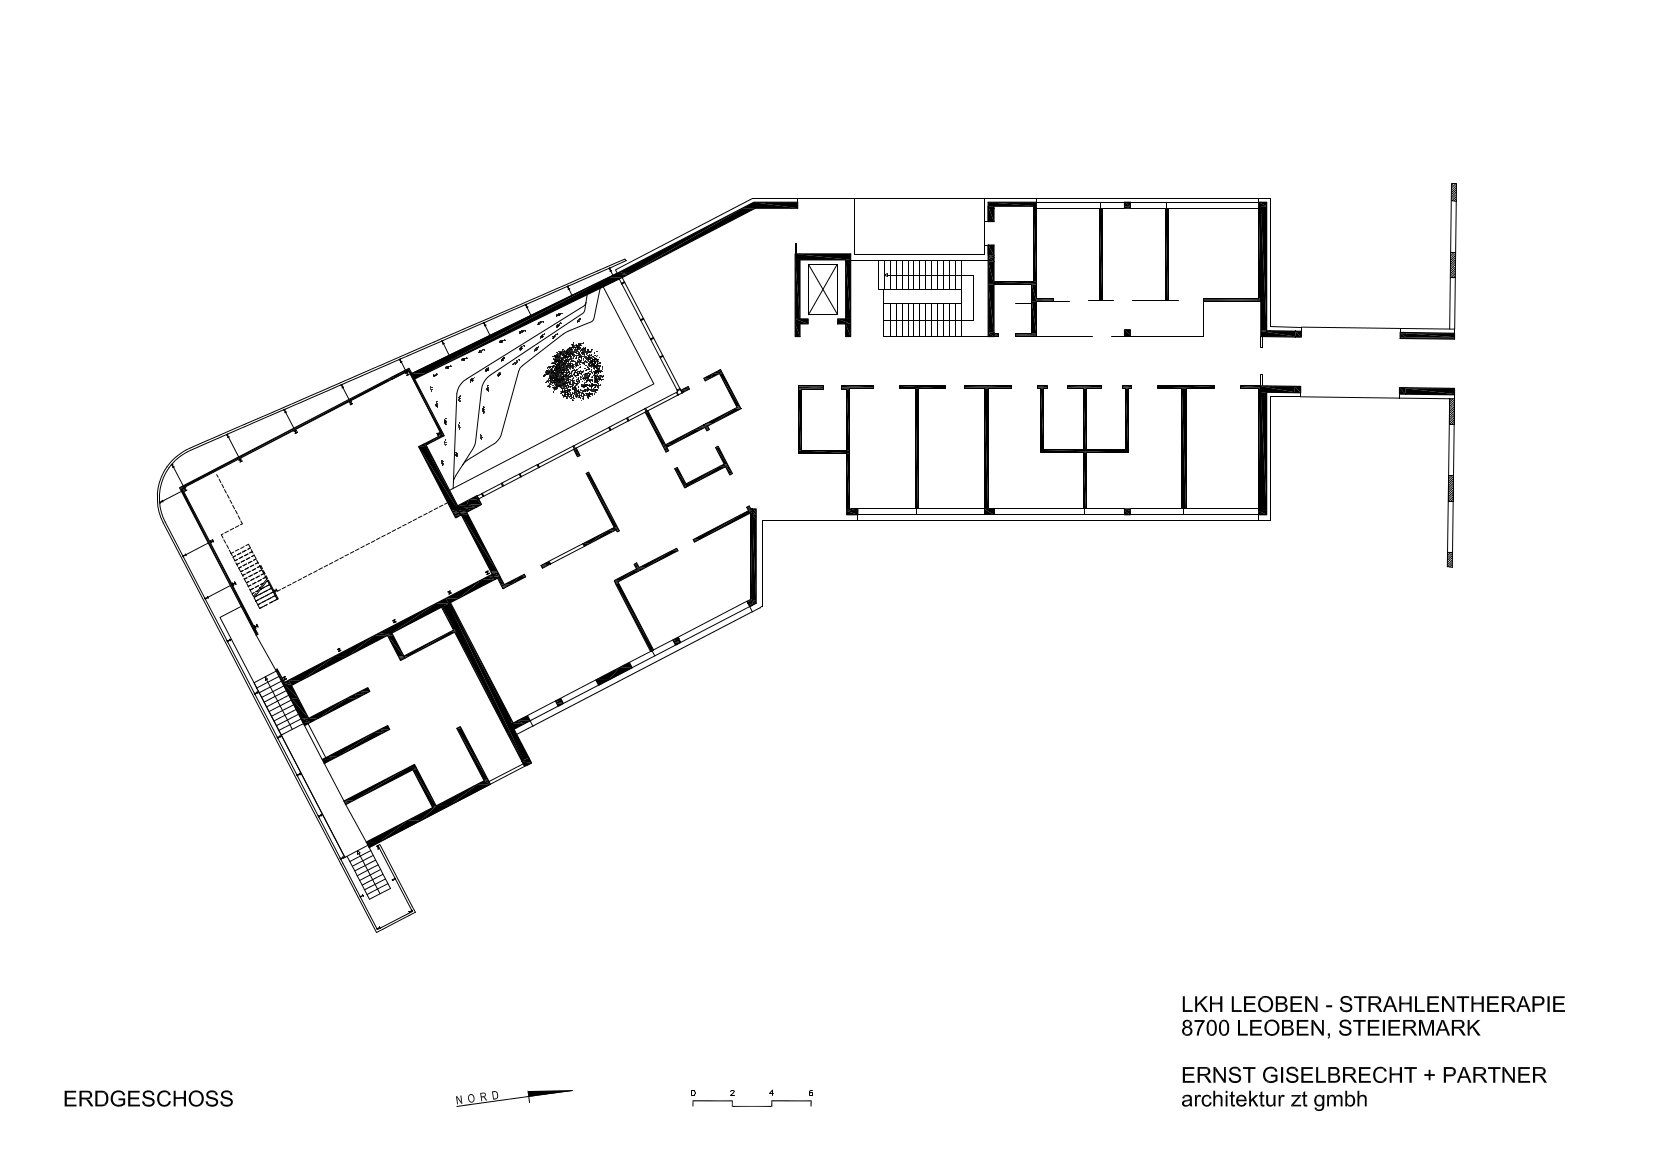 Ground Floor Giselbrecht+Partner}